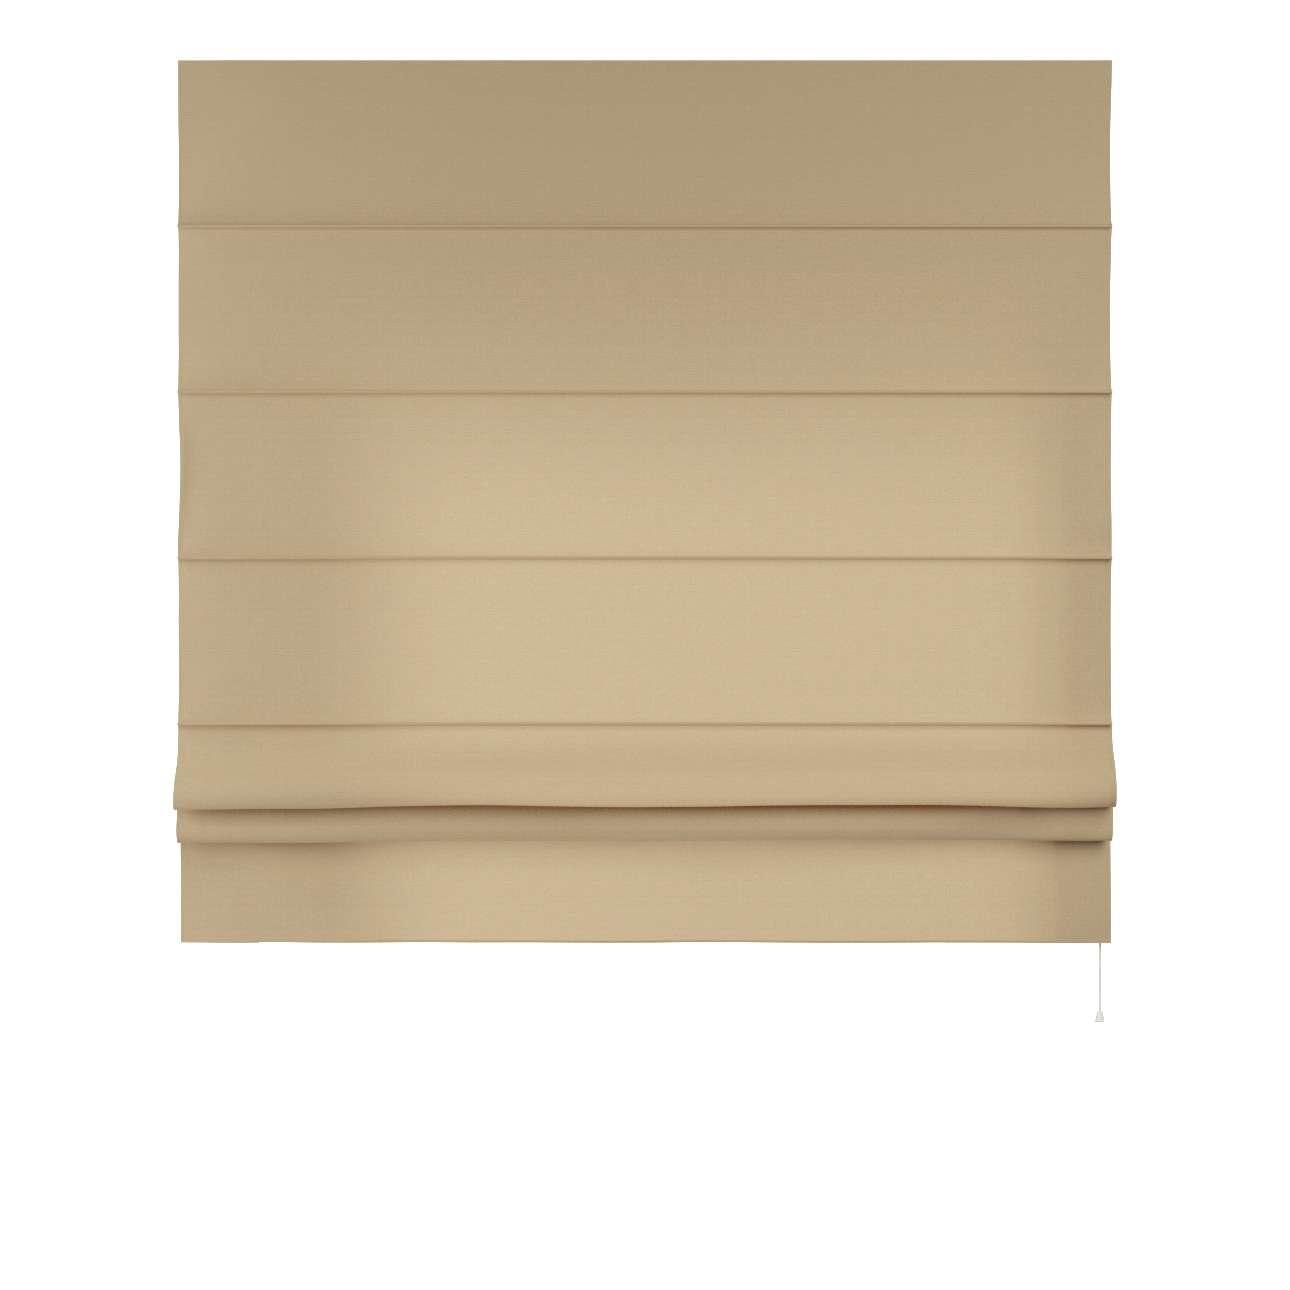 Vouwgordijn Padva van de collectie Cotton Panama, Stof: 702-01